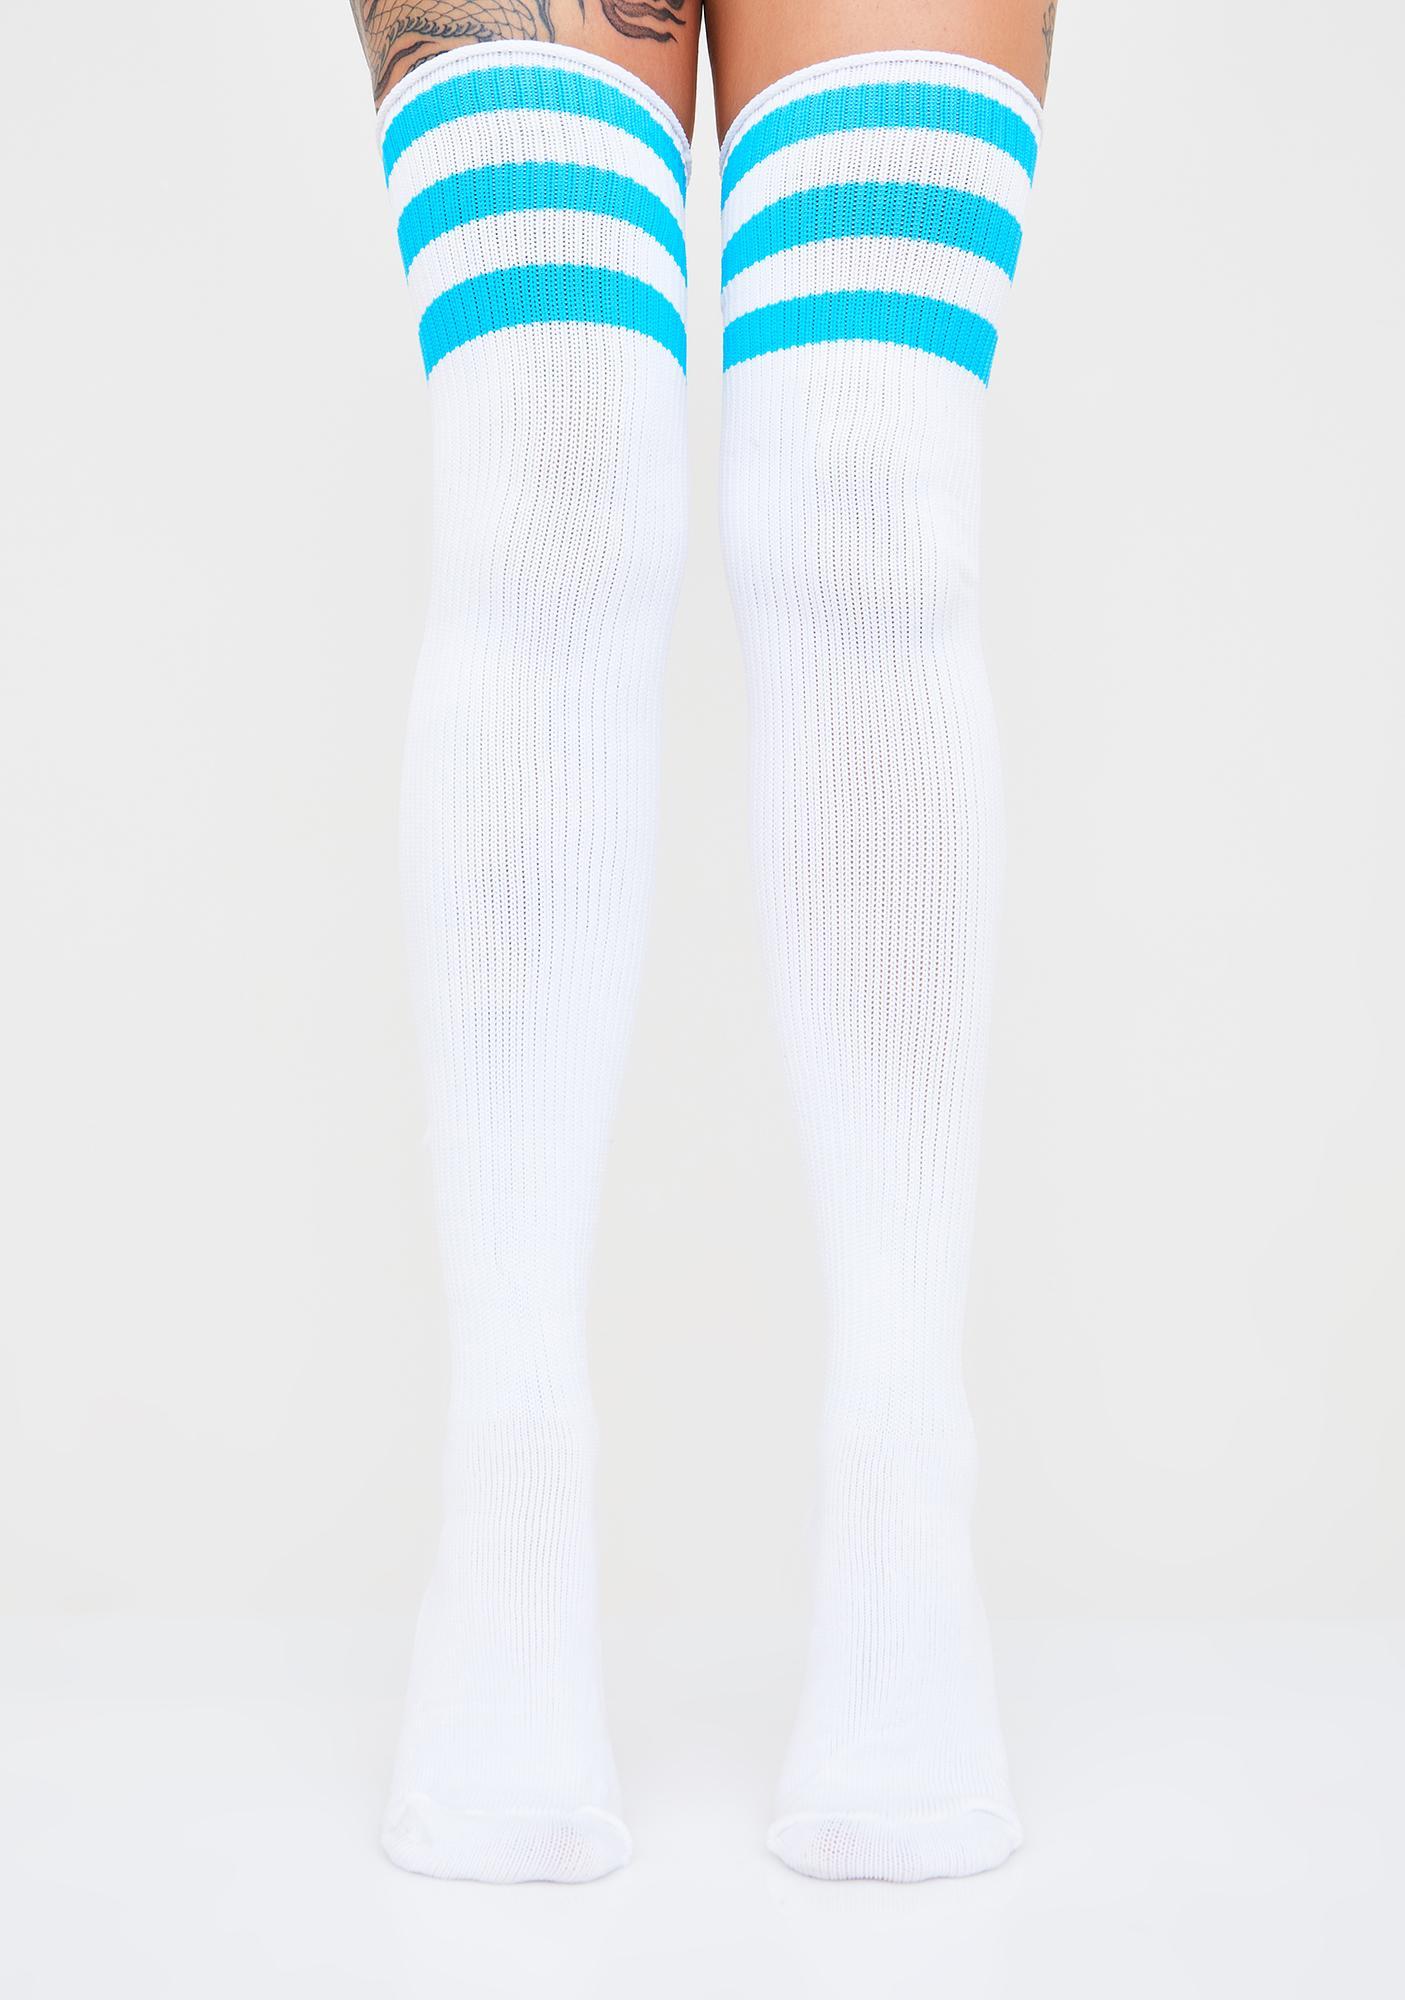 Ice Princess Thigh High Socks